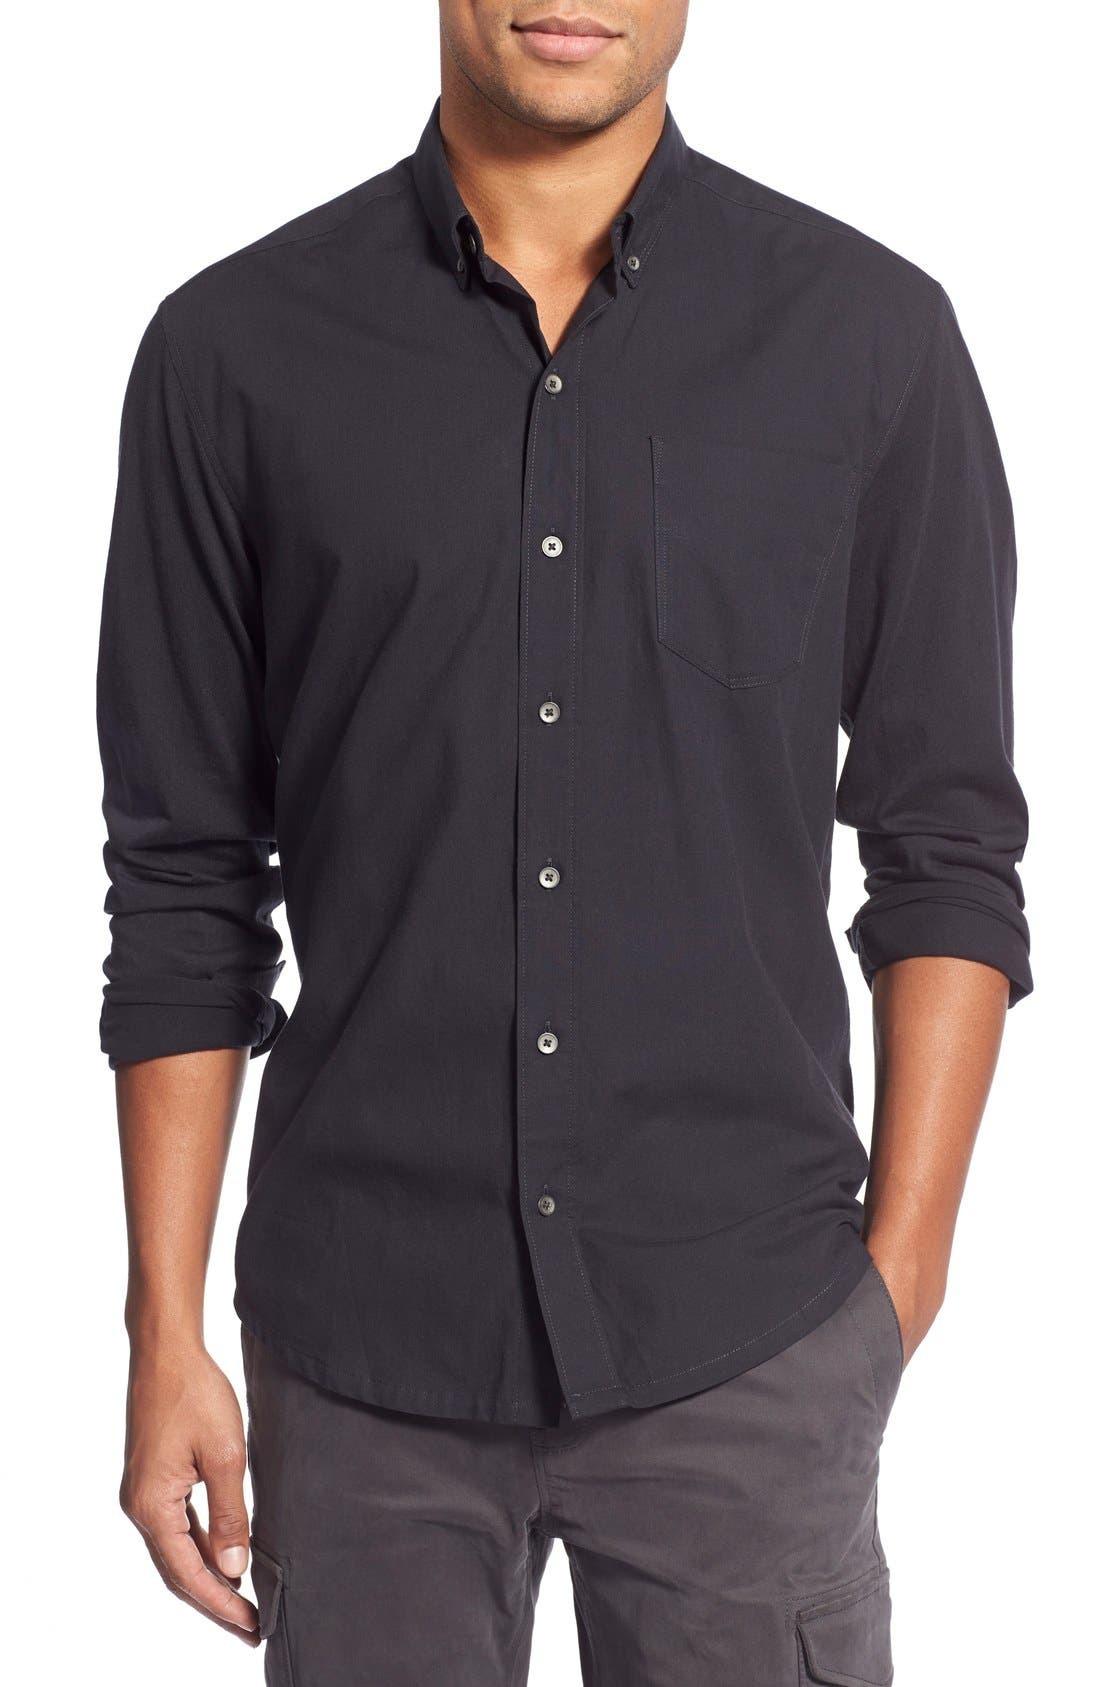 'Reworkd' Slim Fit Solid Mixed Media Sport Shirt,                         Main,                         color, Black